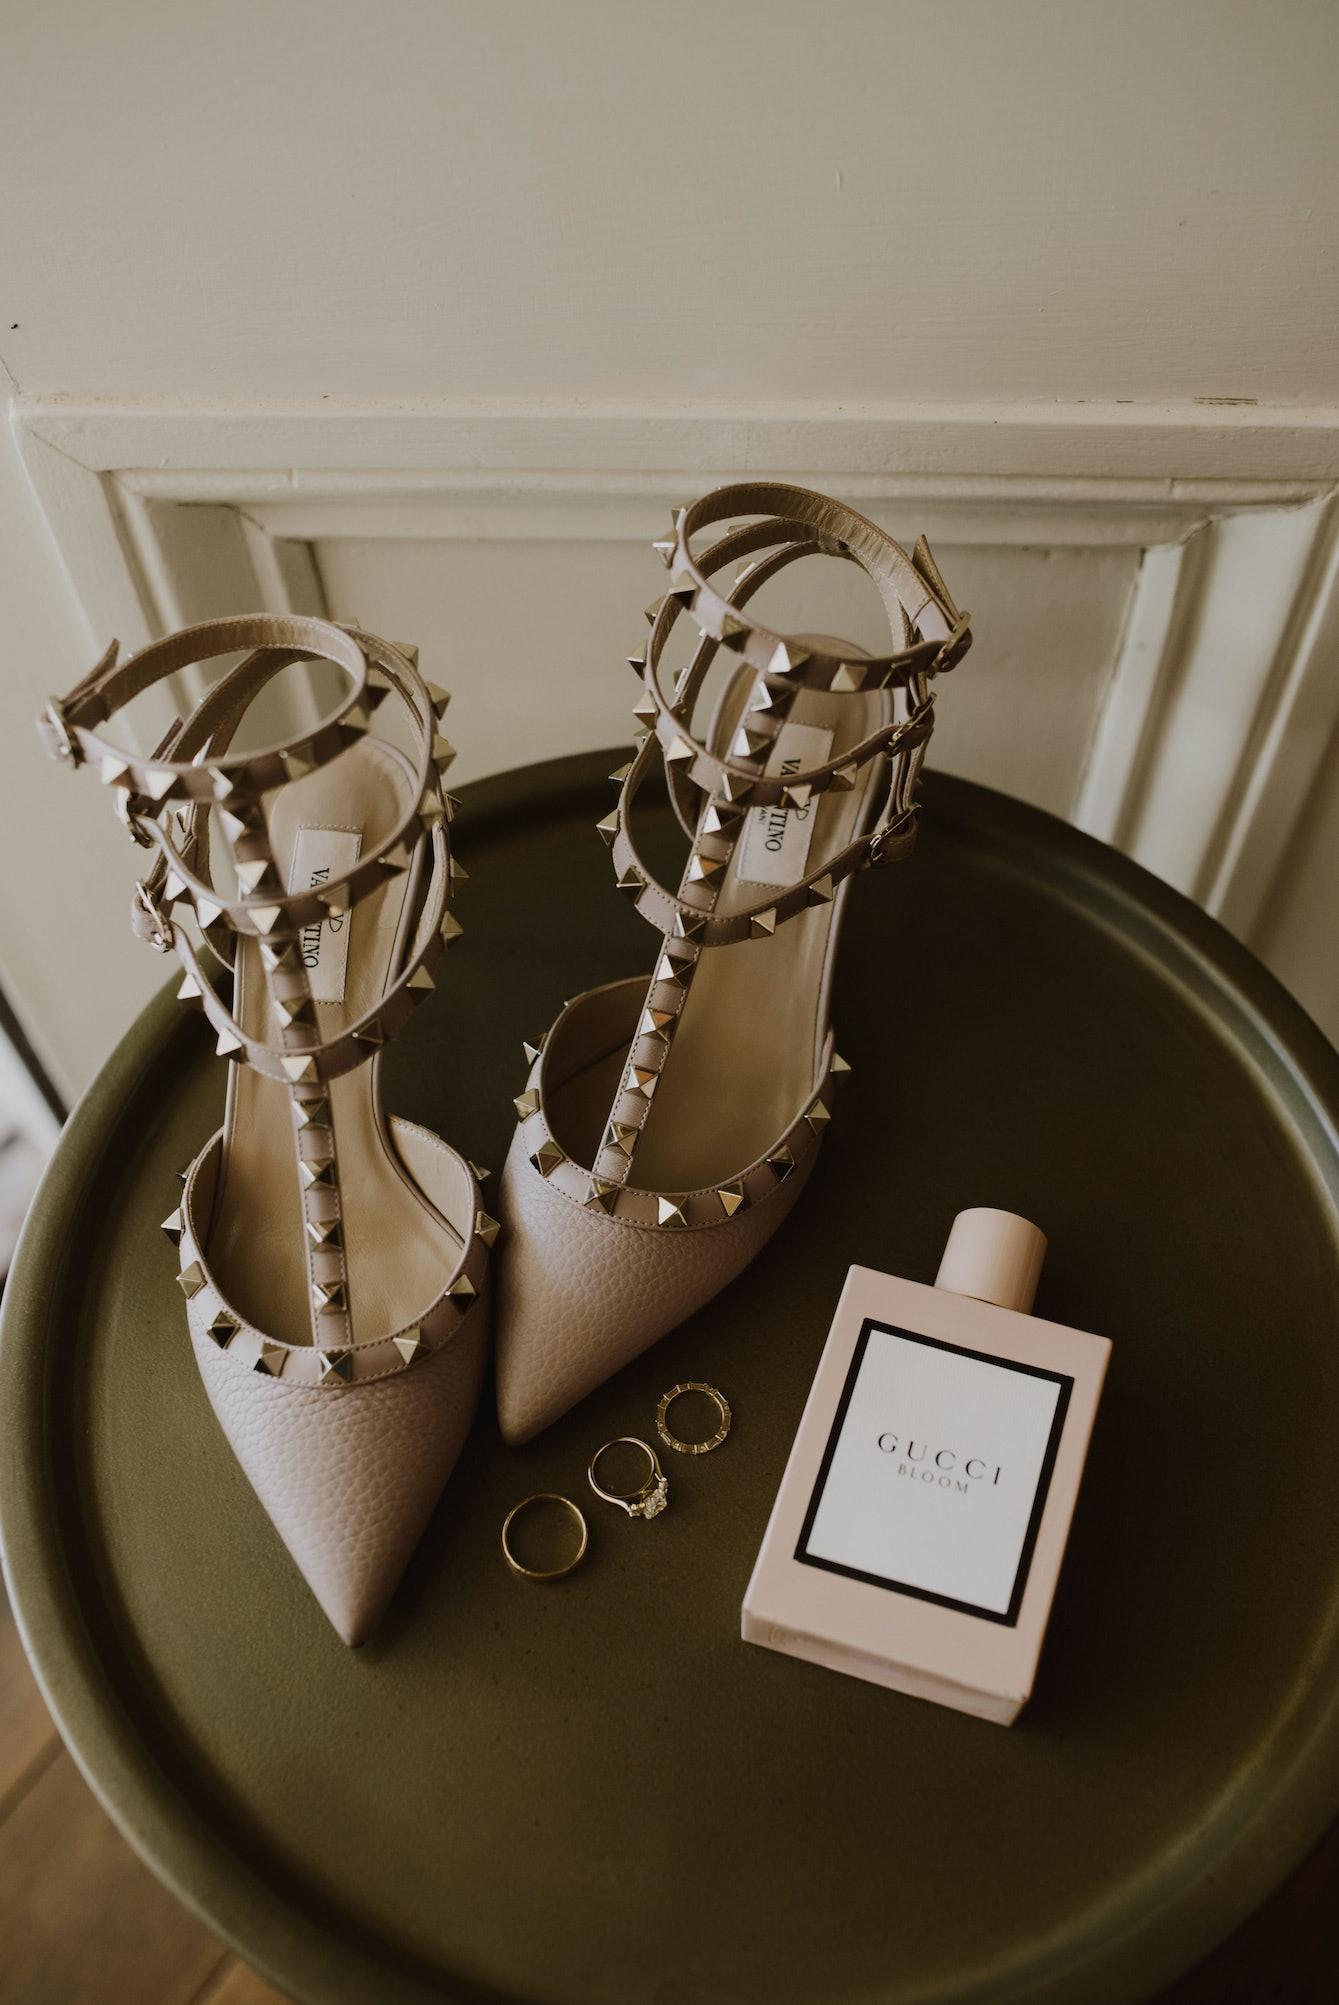 Valentino wedding shoes, perfume and wedding rings